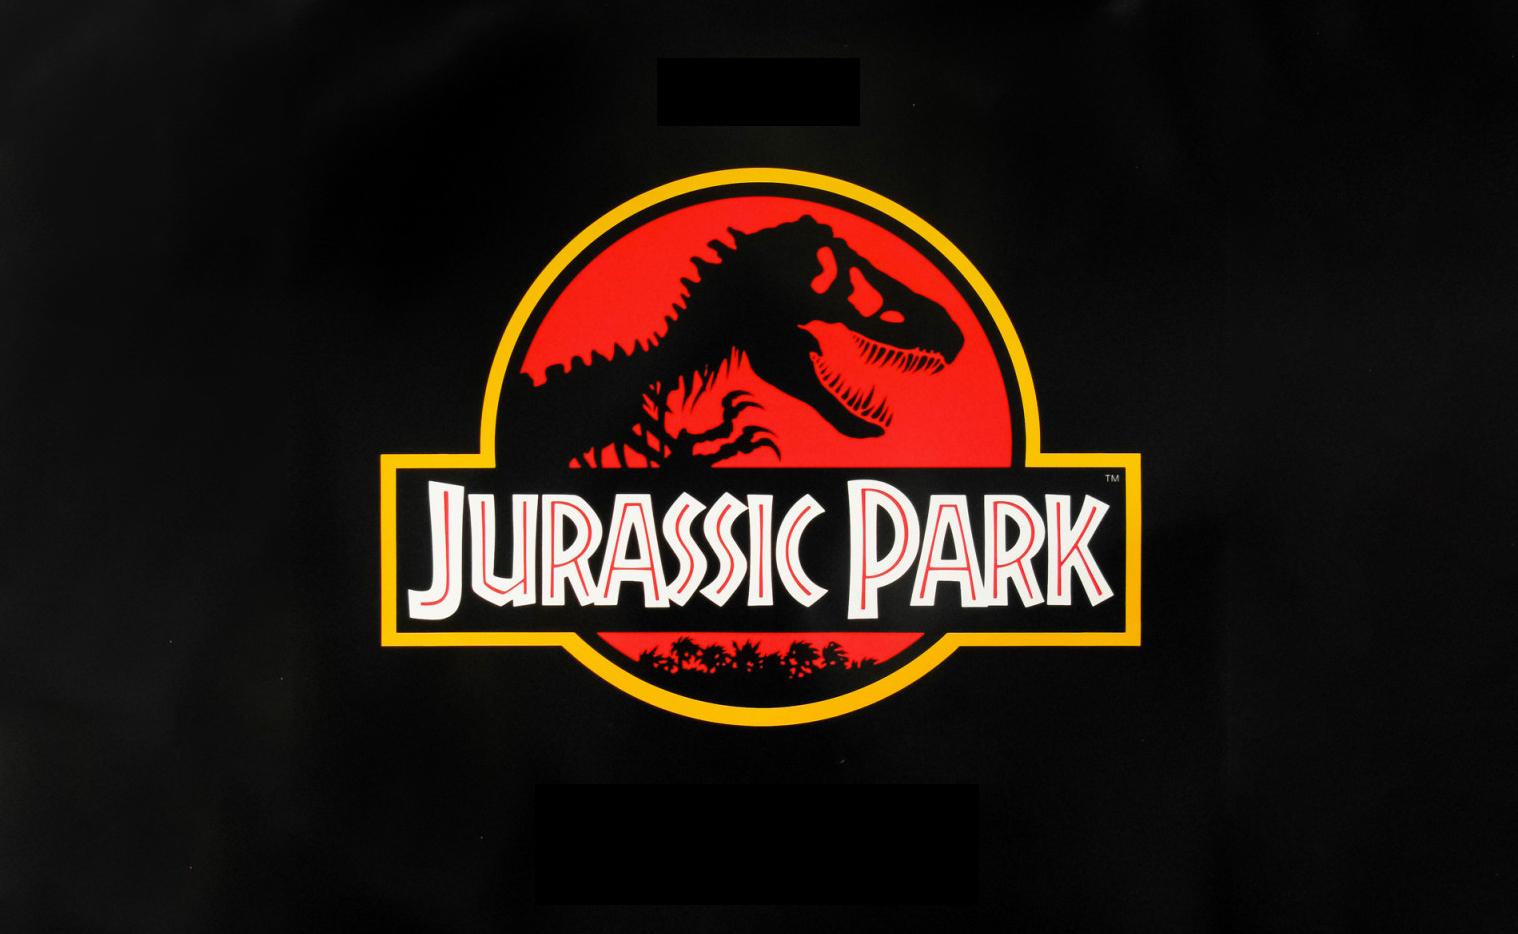 Jurassic Park logosaurus